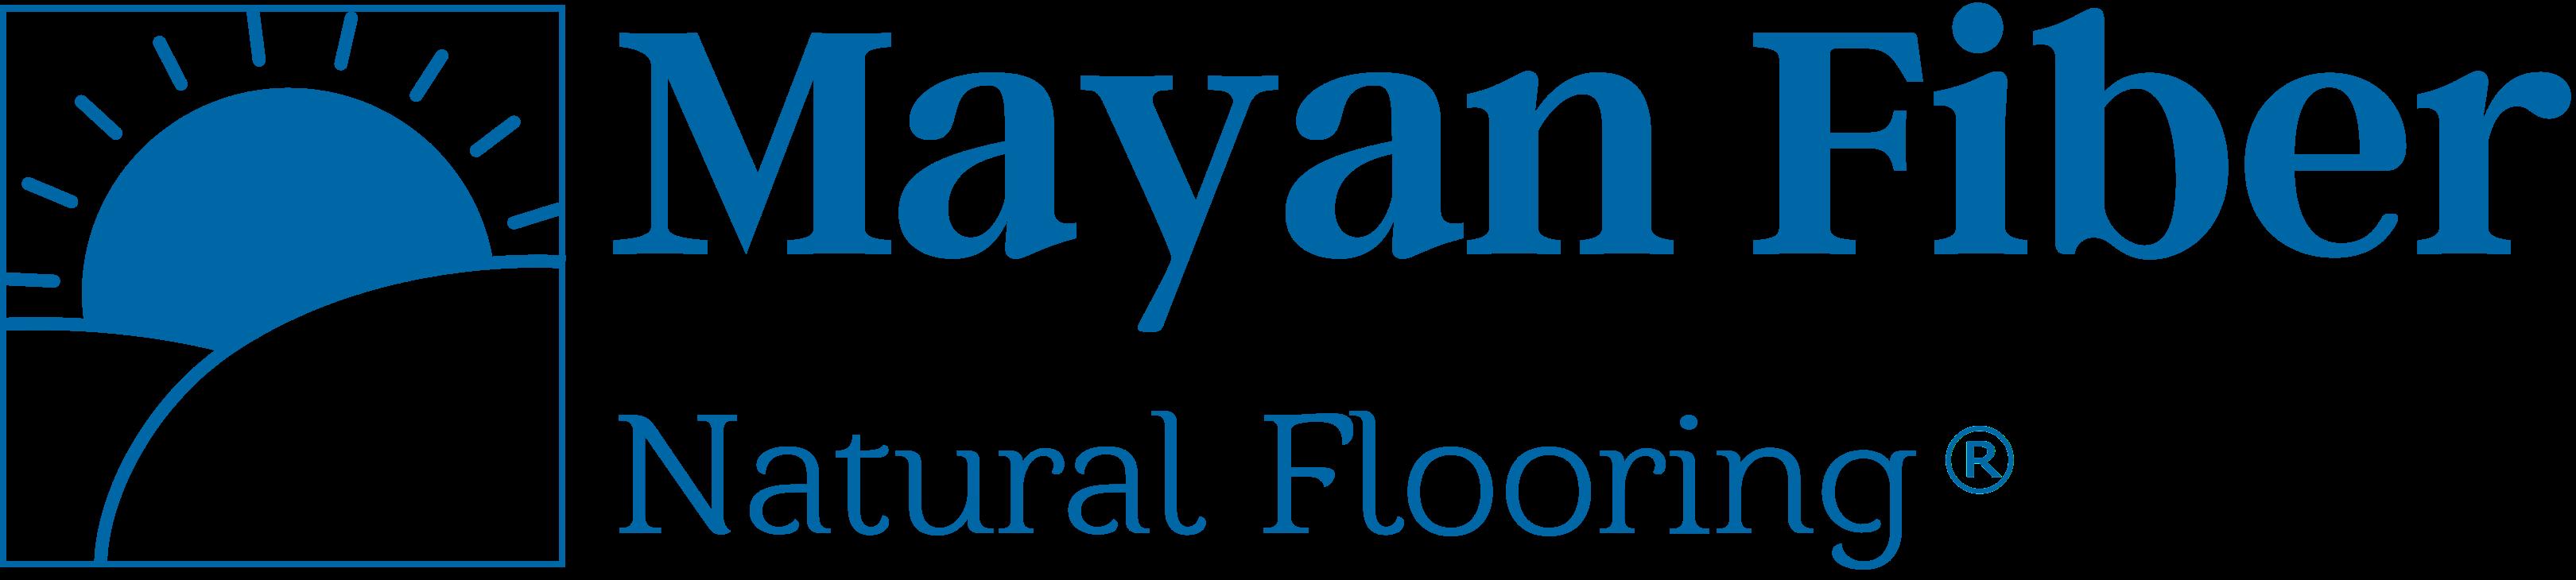 LogoMayan